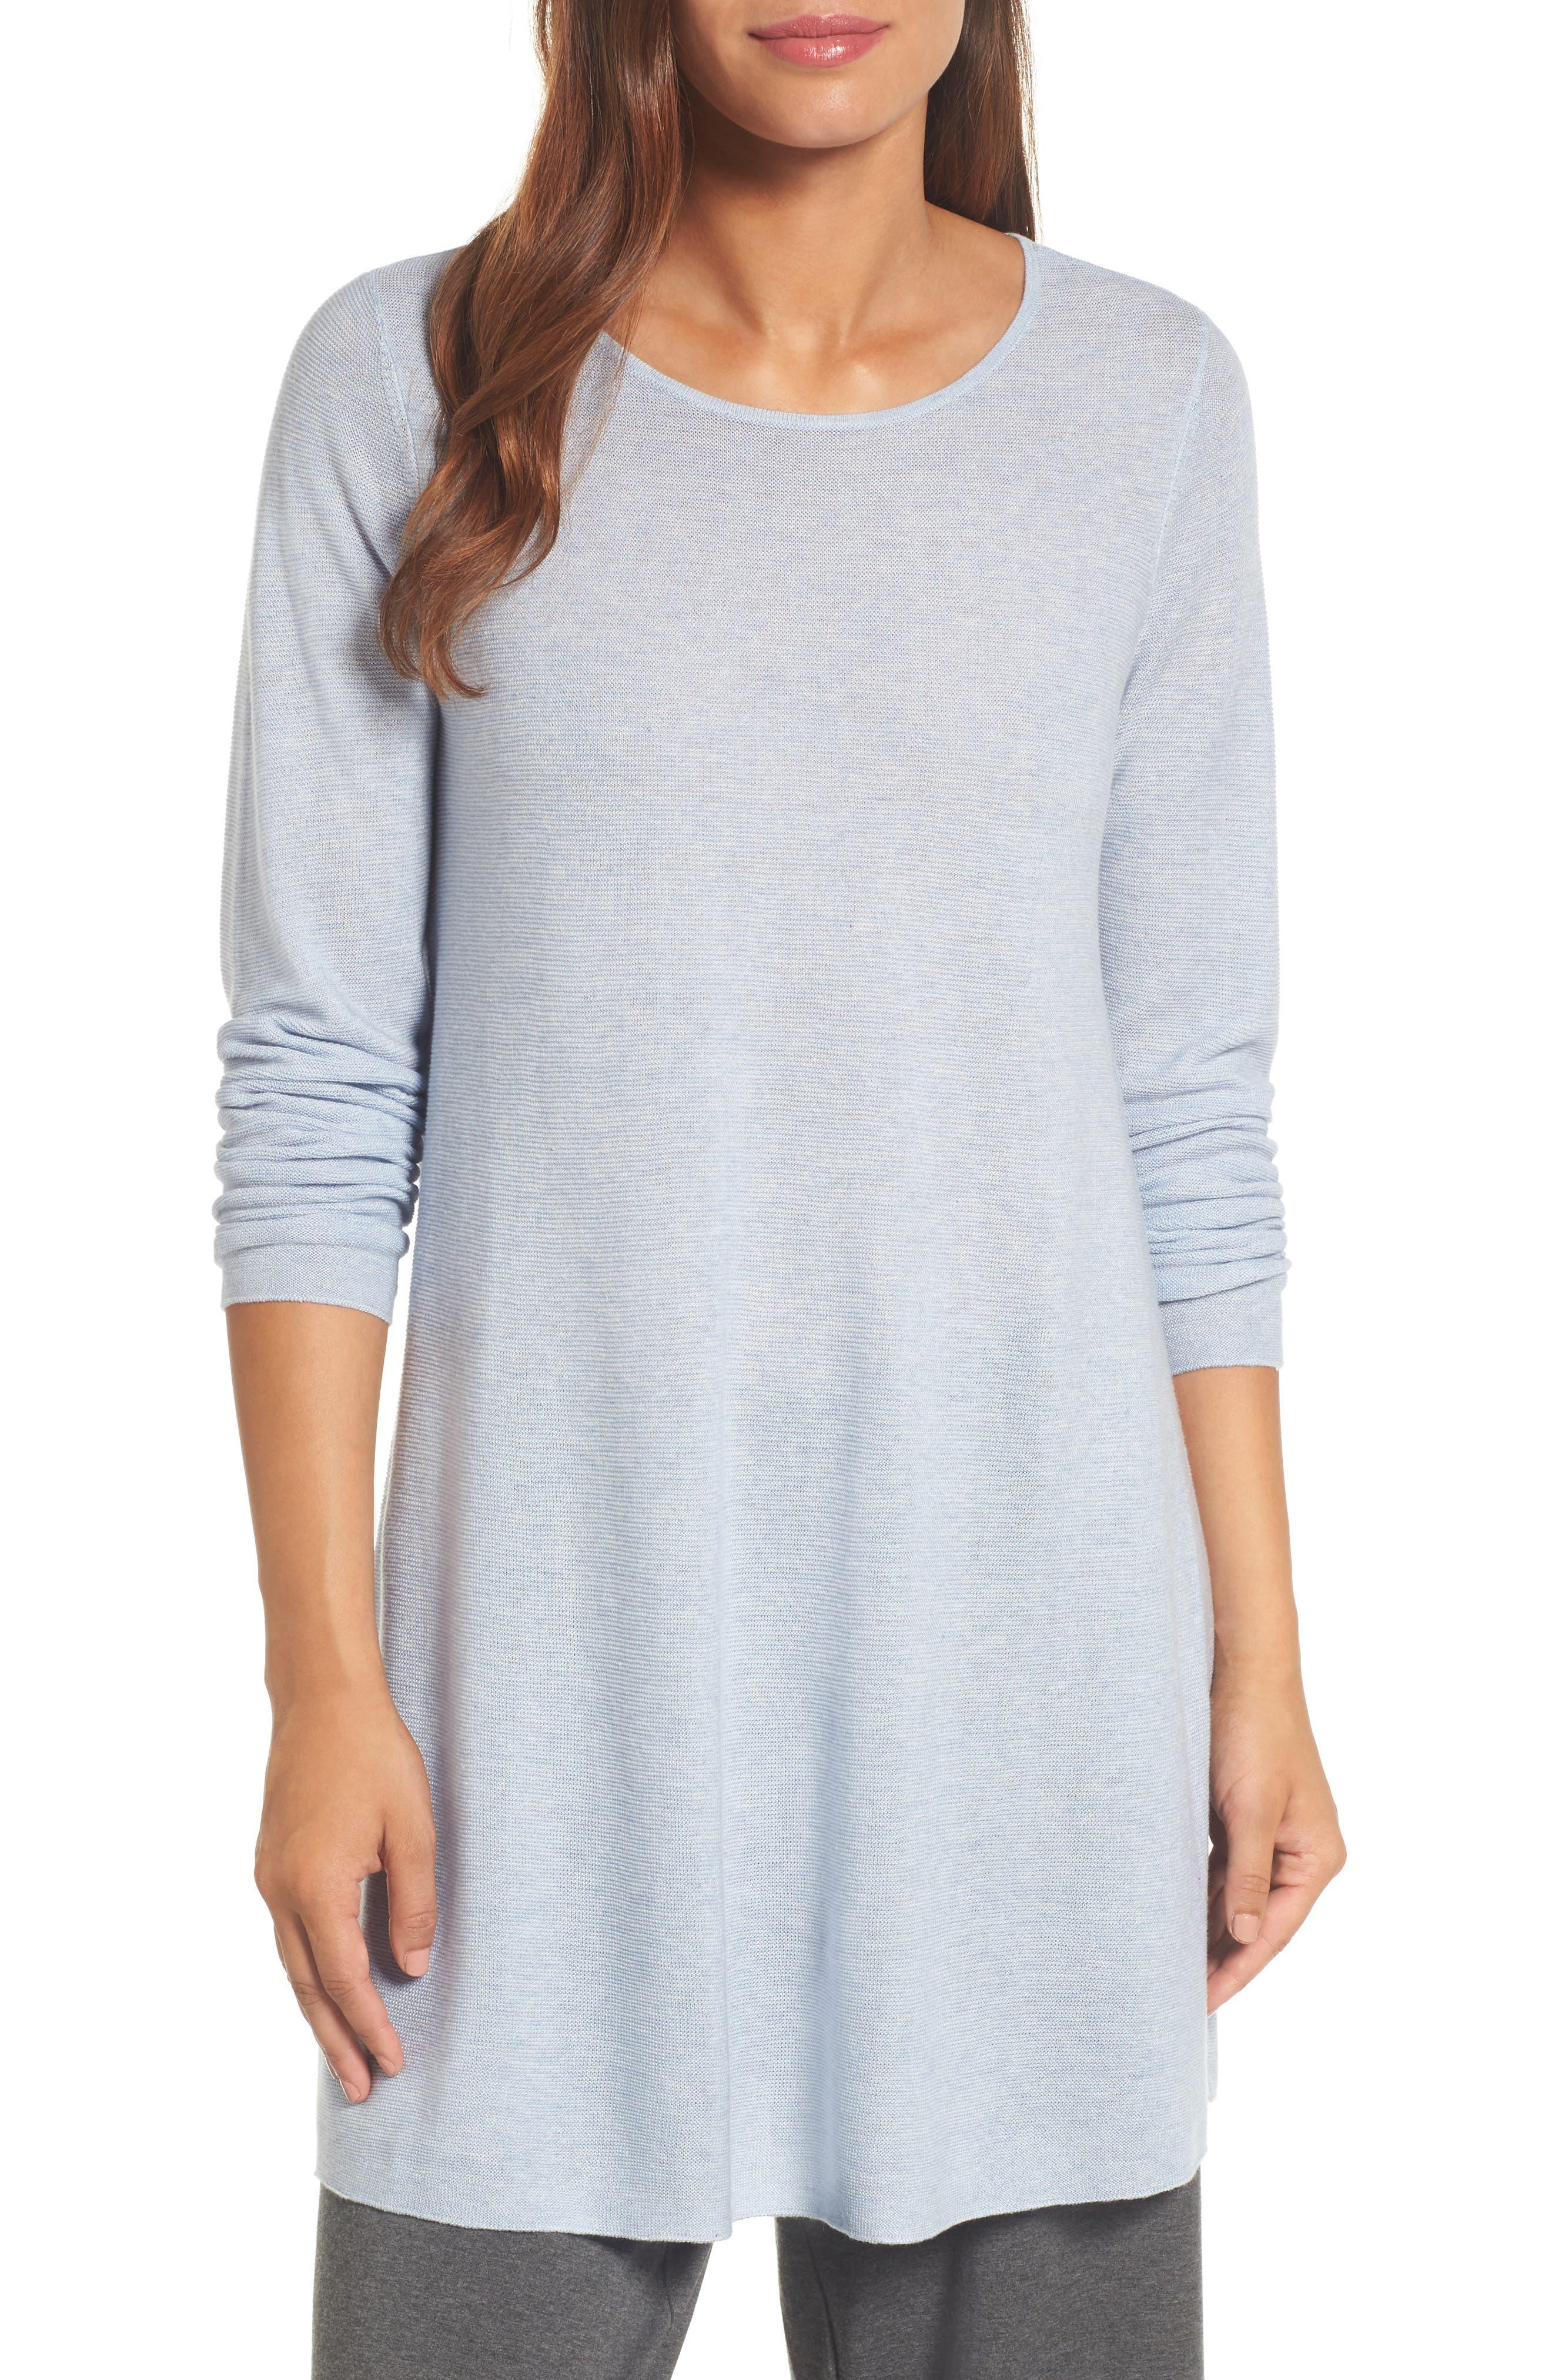 Main Image - Eileen Fisher Jewel Neck Tunic Sweater